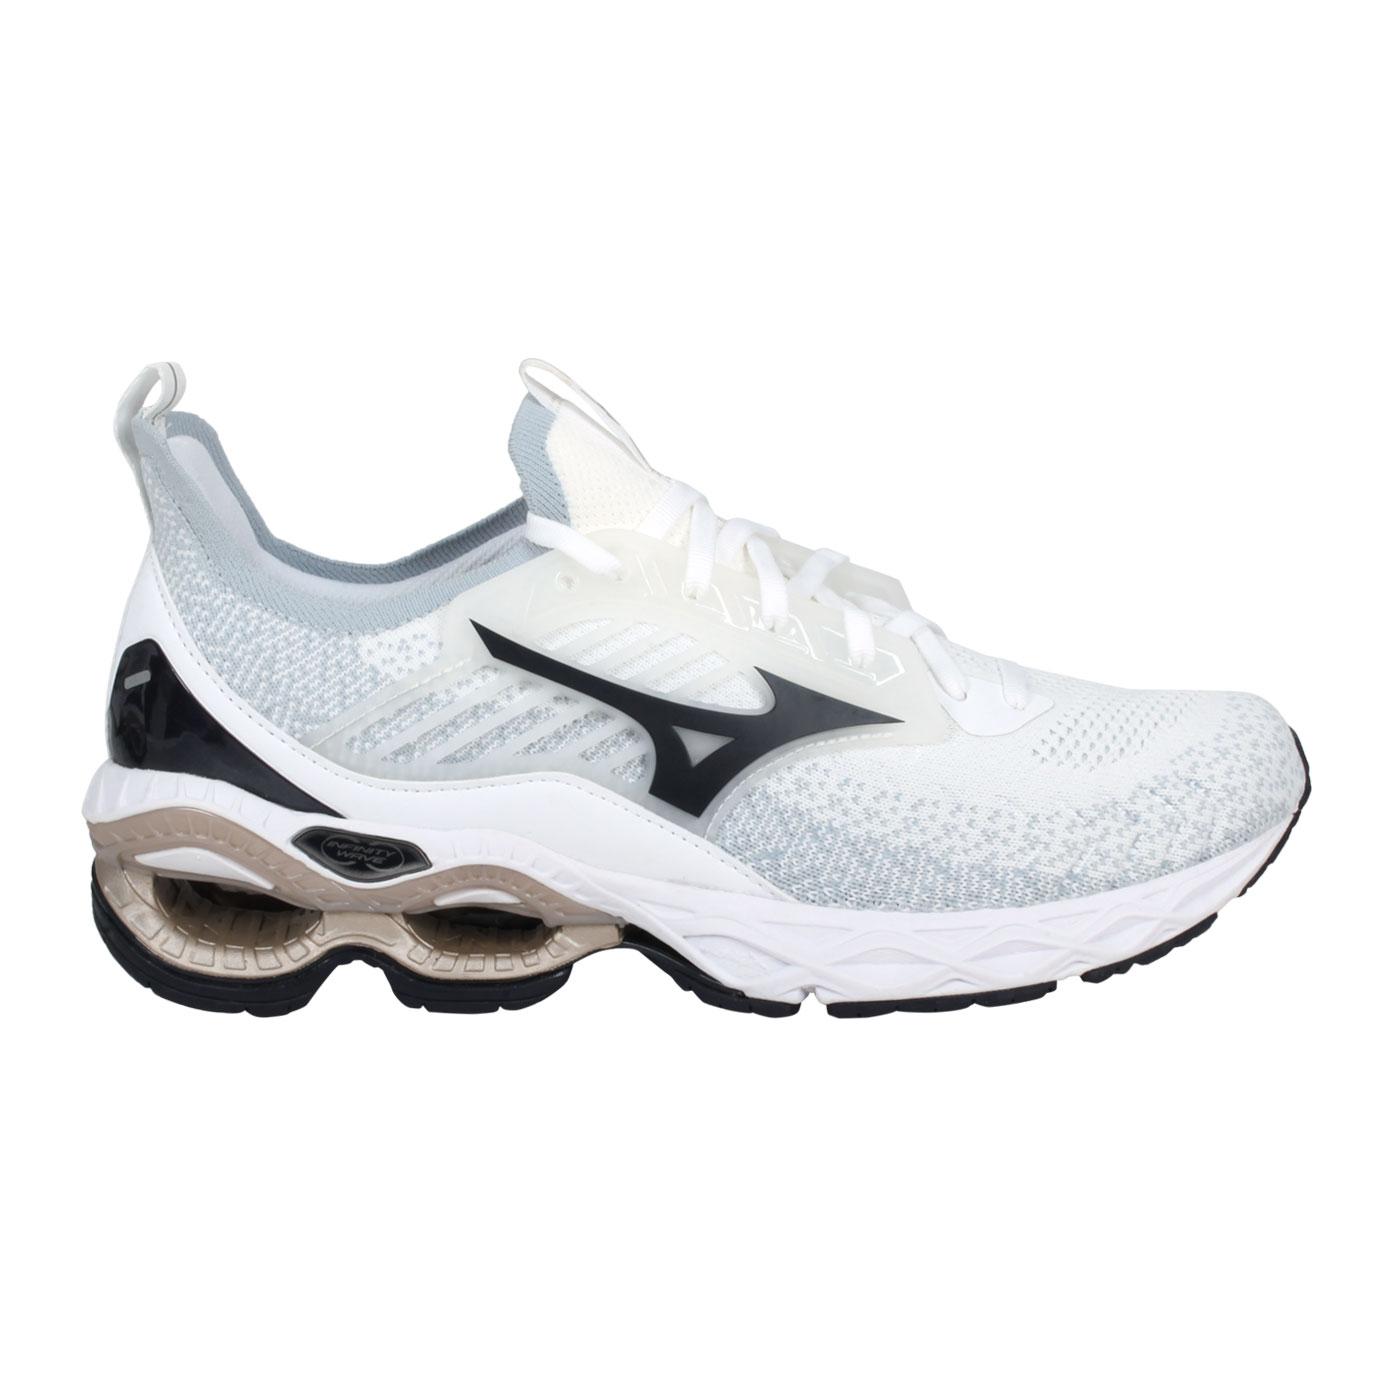 MIZUNO 男款慢跑鞋  @WAVE CREATION 22 WAVEKNIT@J1GC213390 - 白黑金